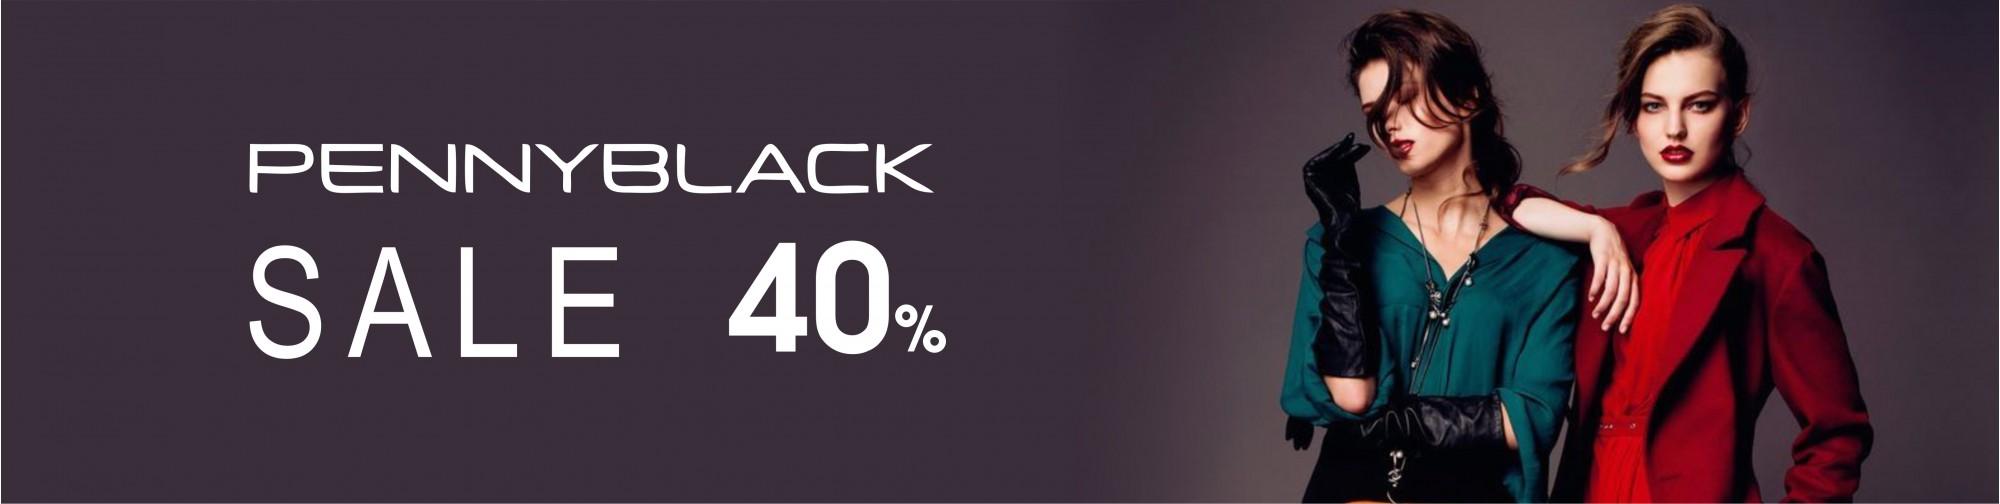 pennyblack 40